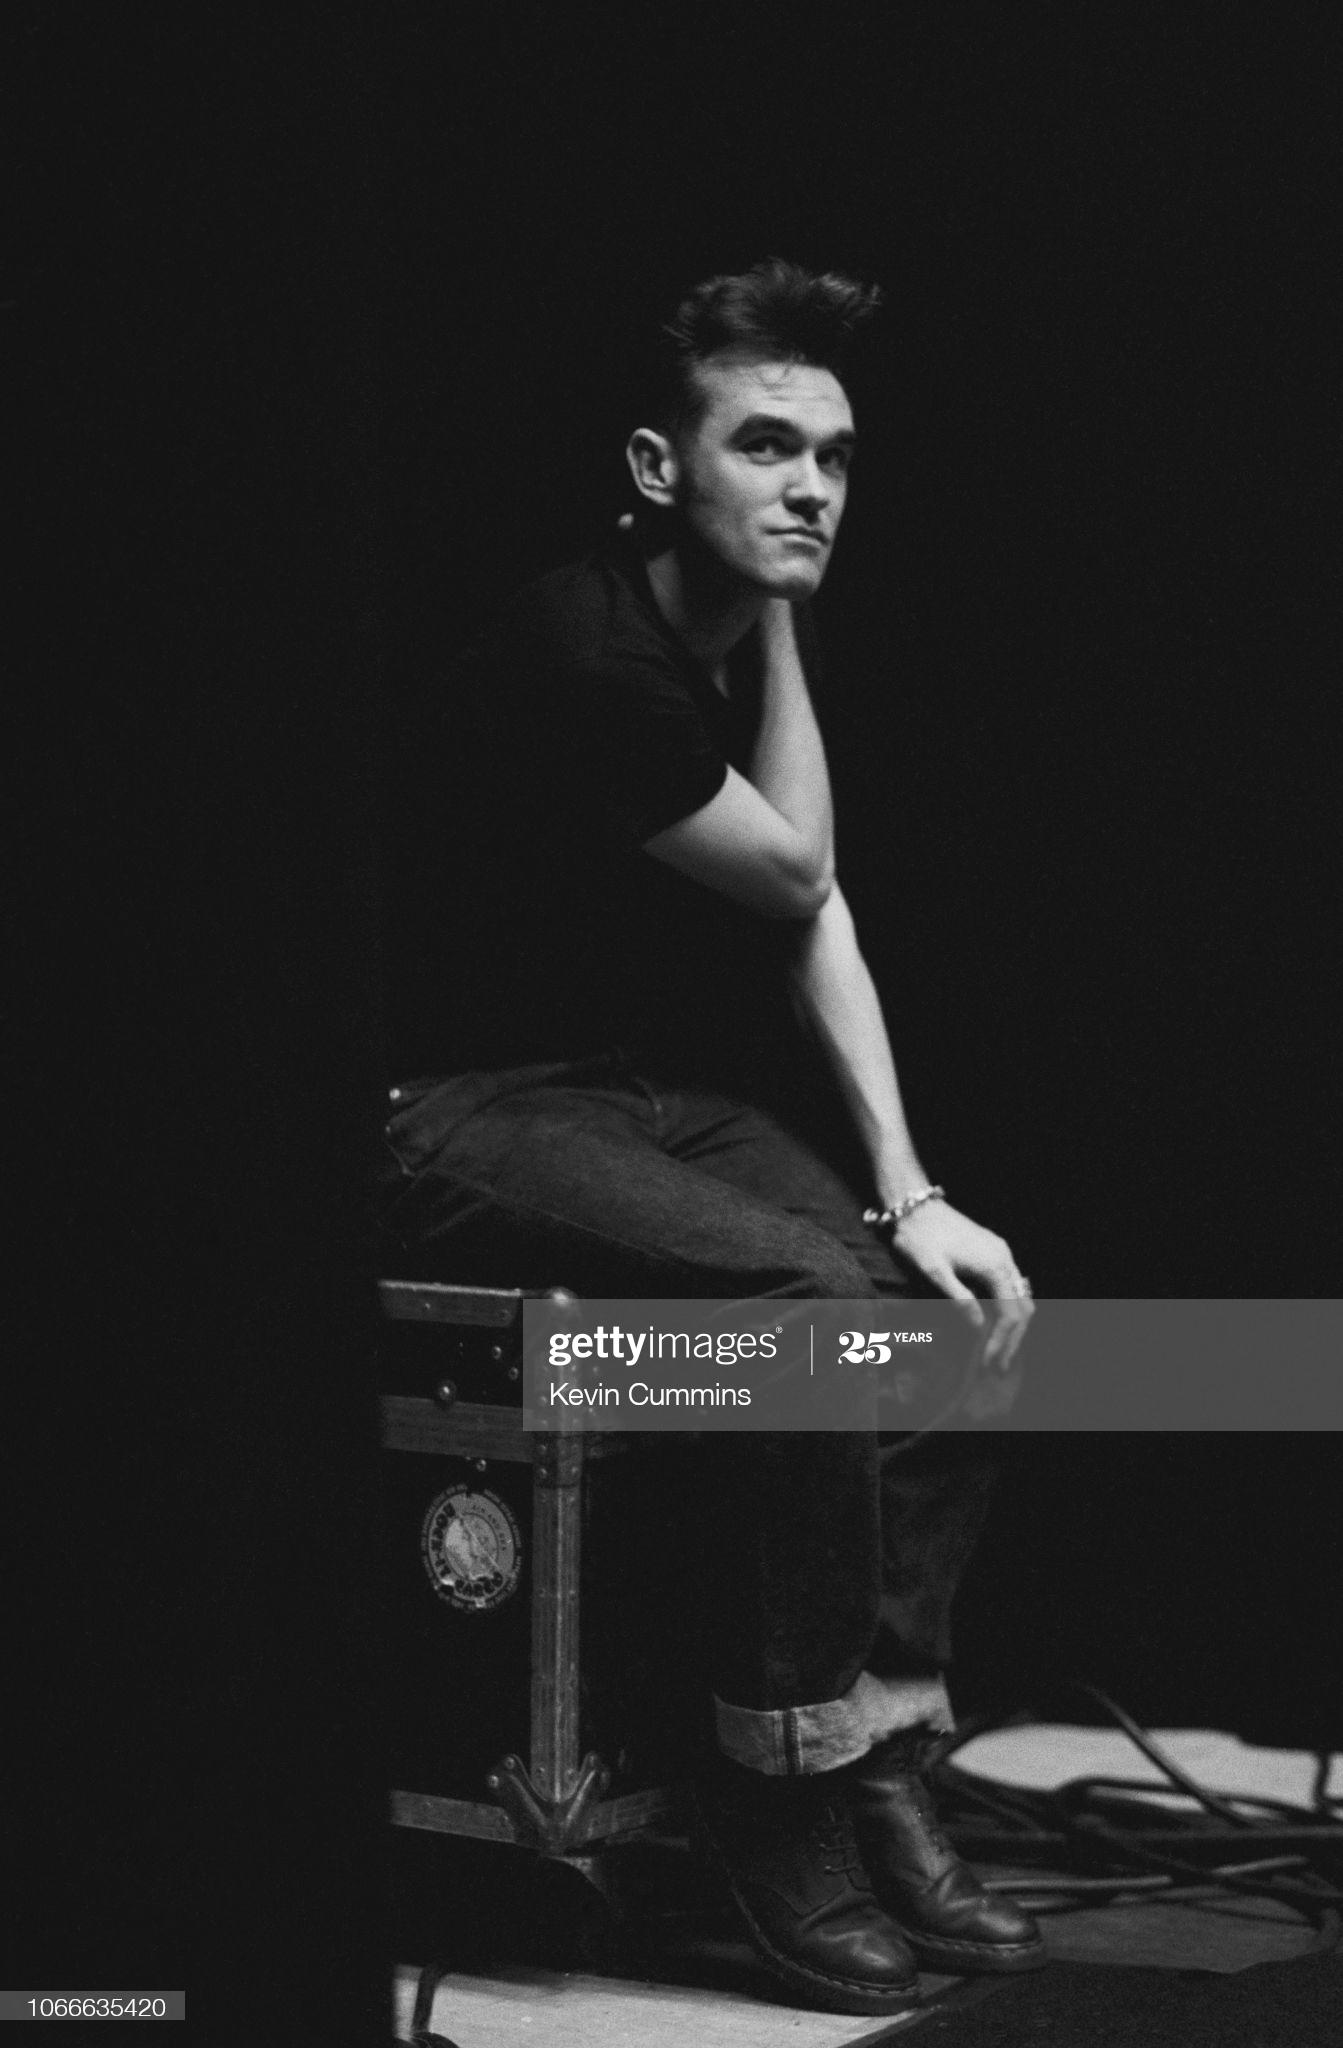 Morrissey ~ Japan September 5th 1991 (iv) Kevin Cummins.jpg